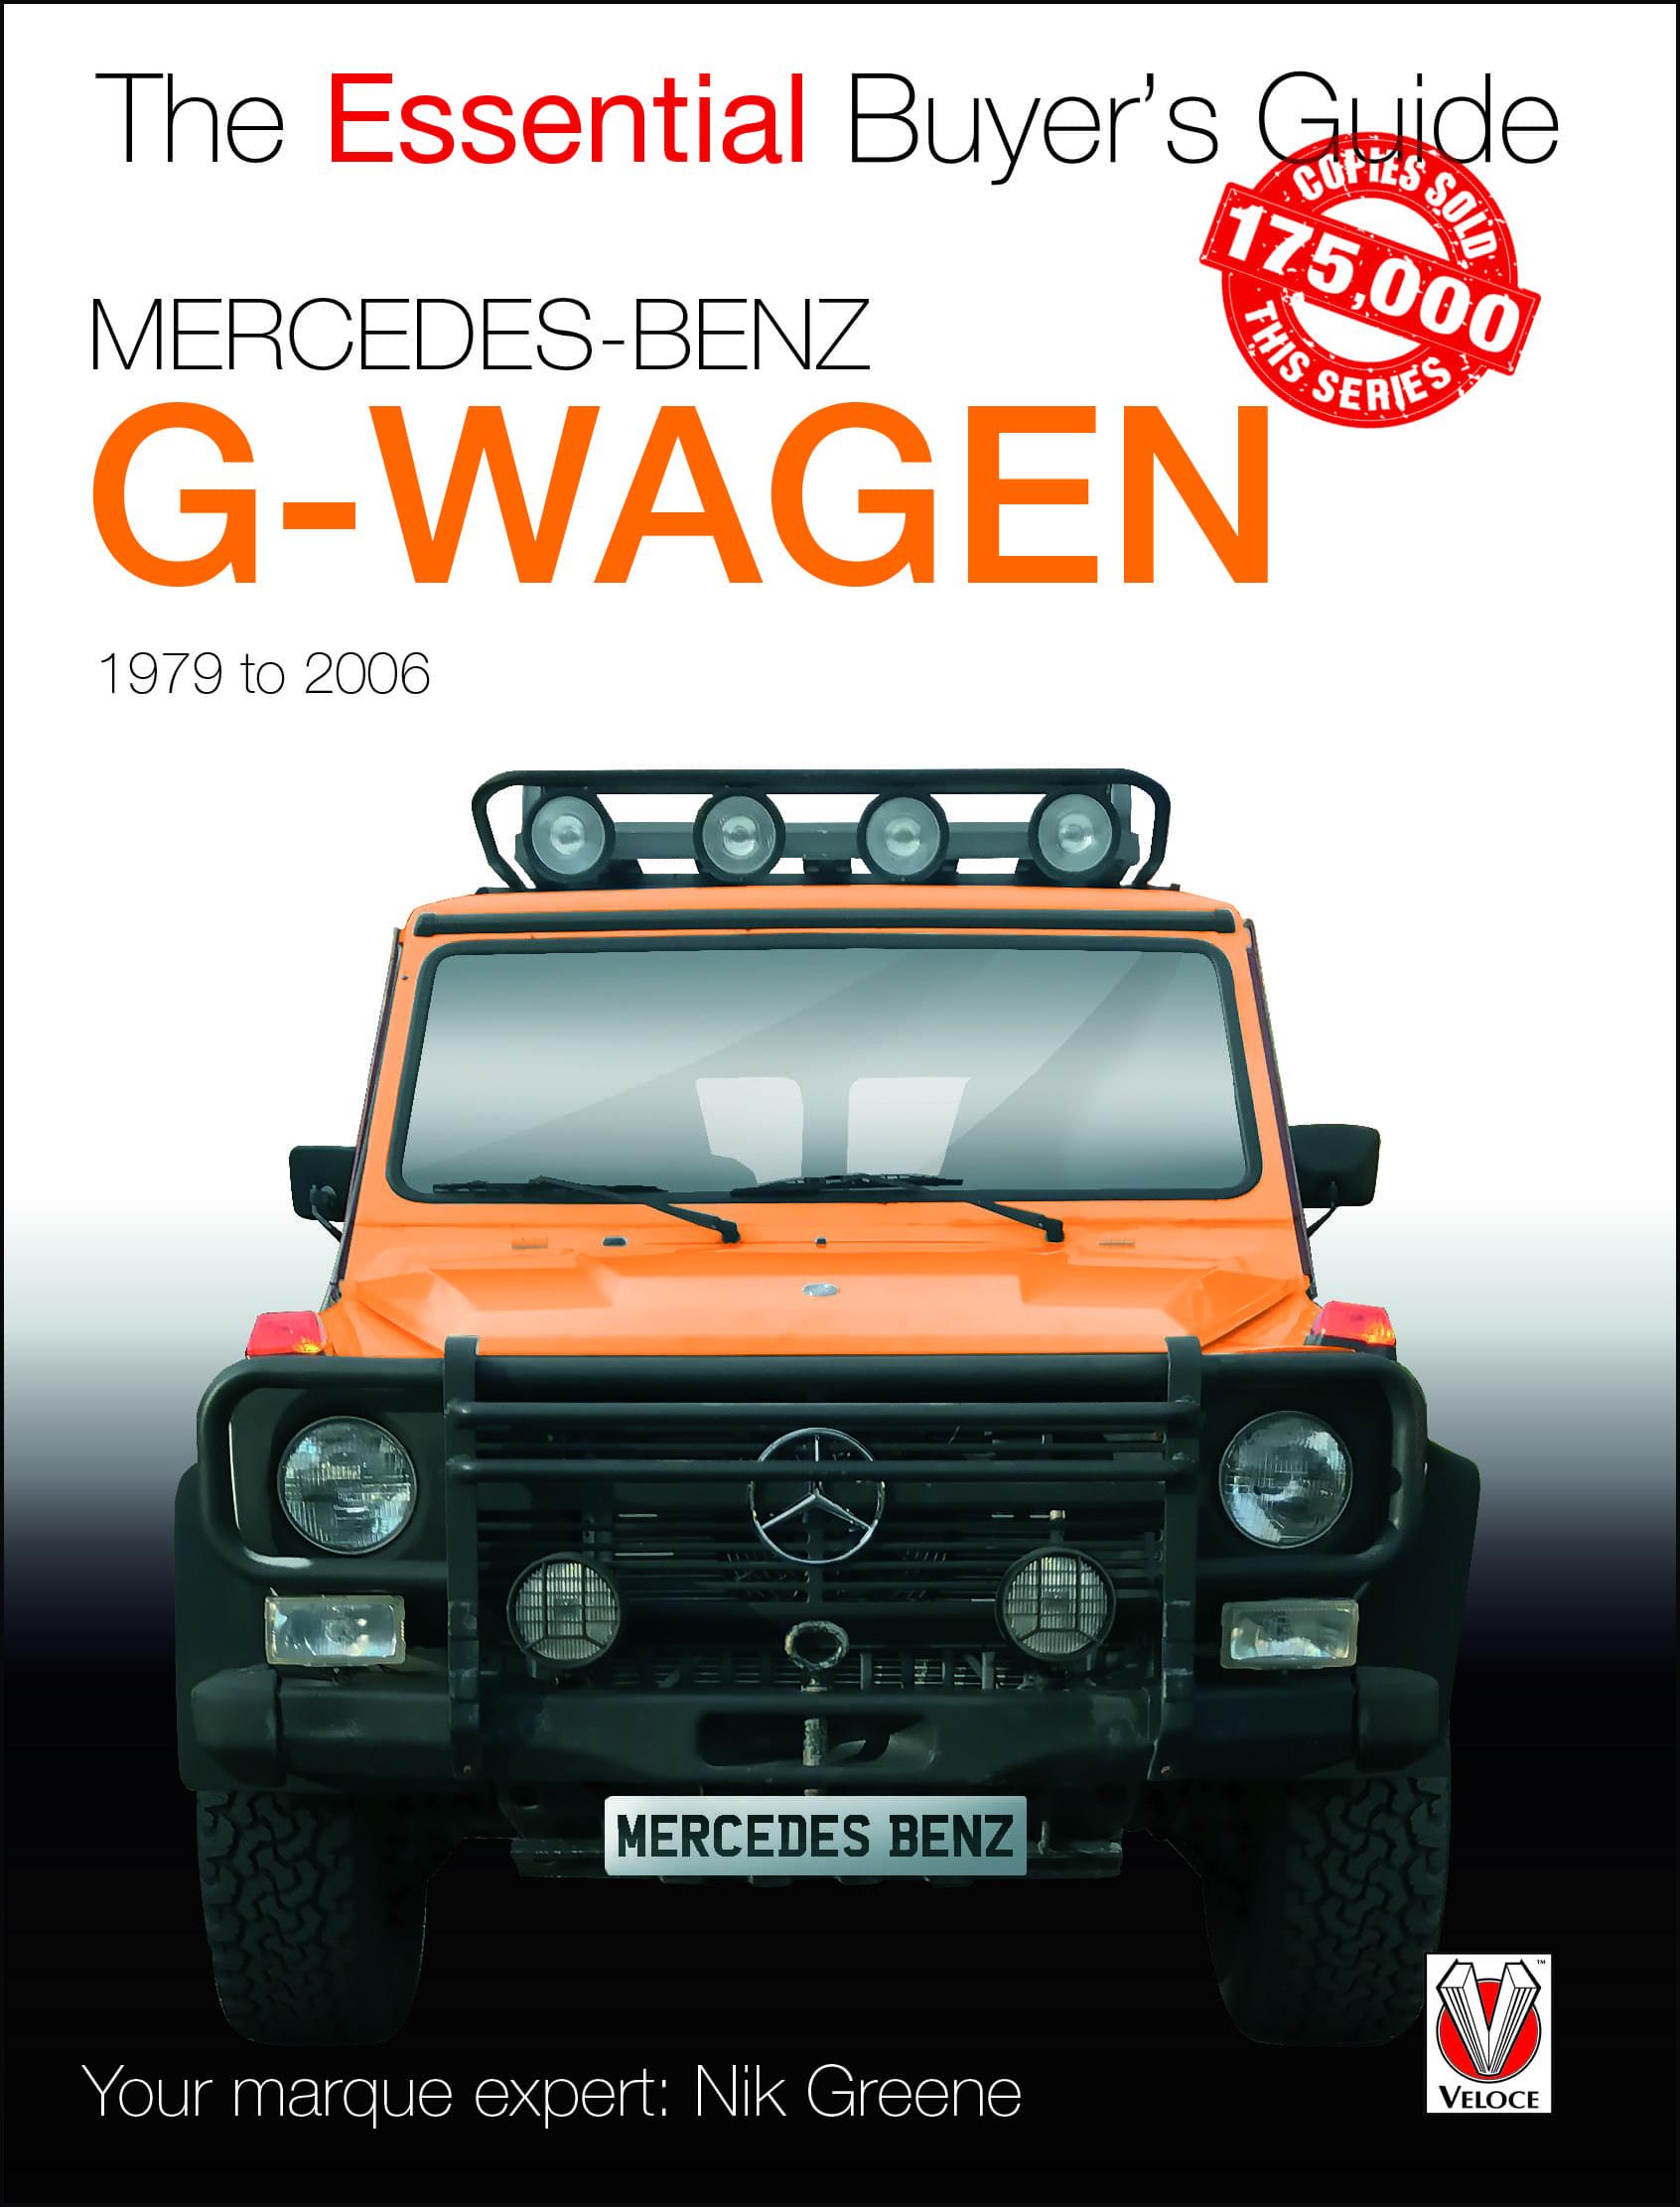 Mercedes-Benz G-Wagen EBG cover